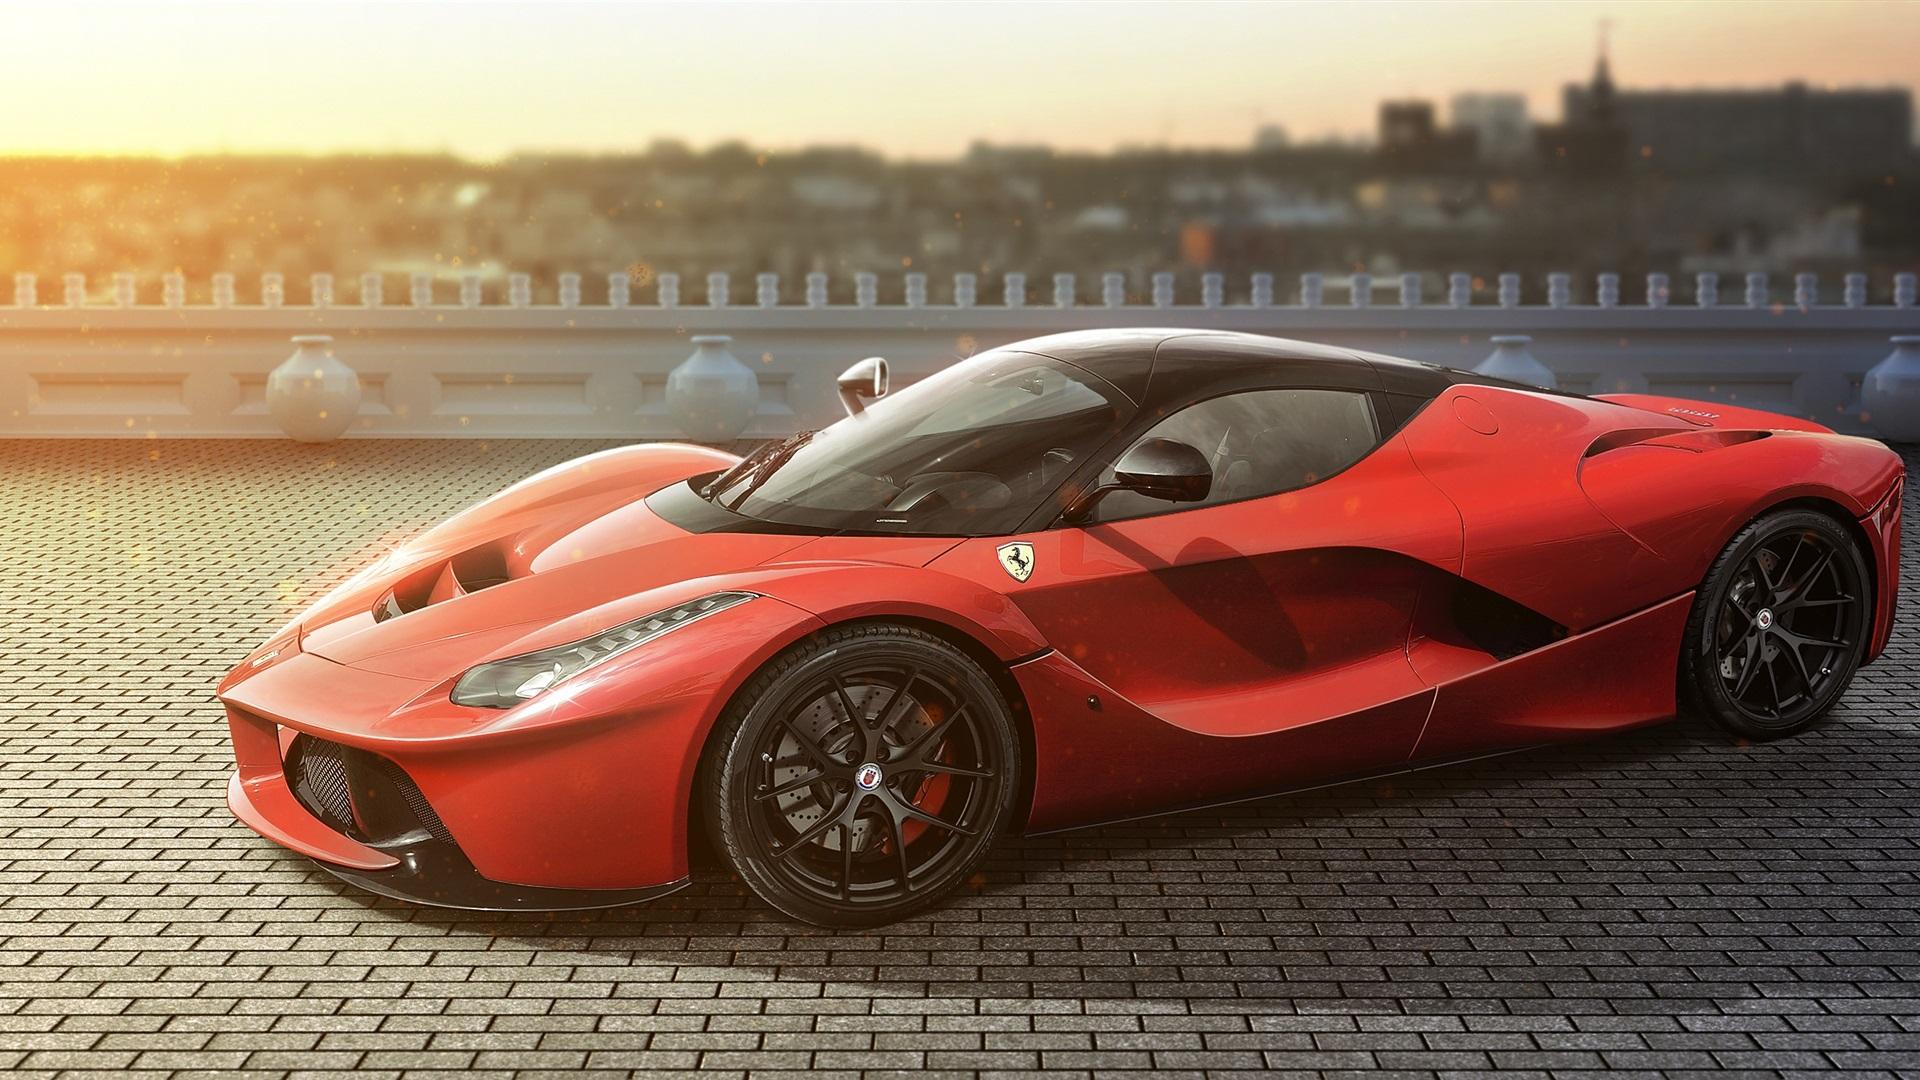 Ferrari Laferrari Wallpaper 4K